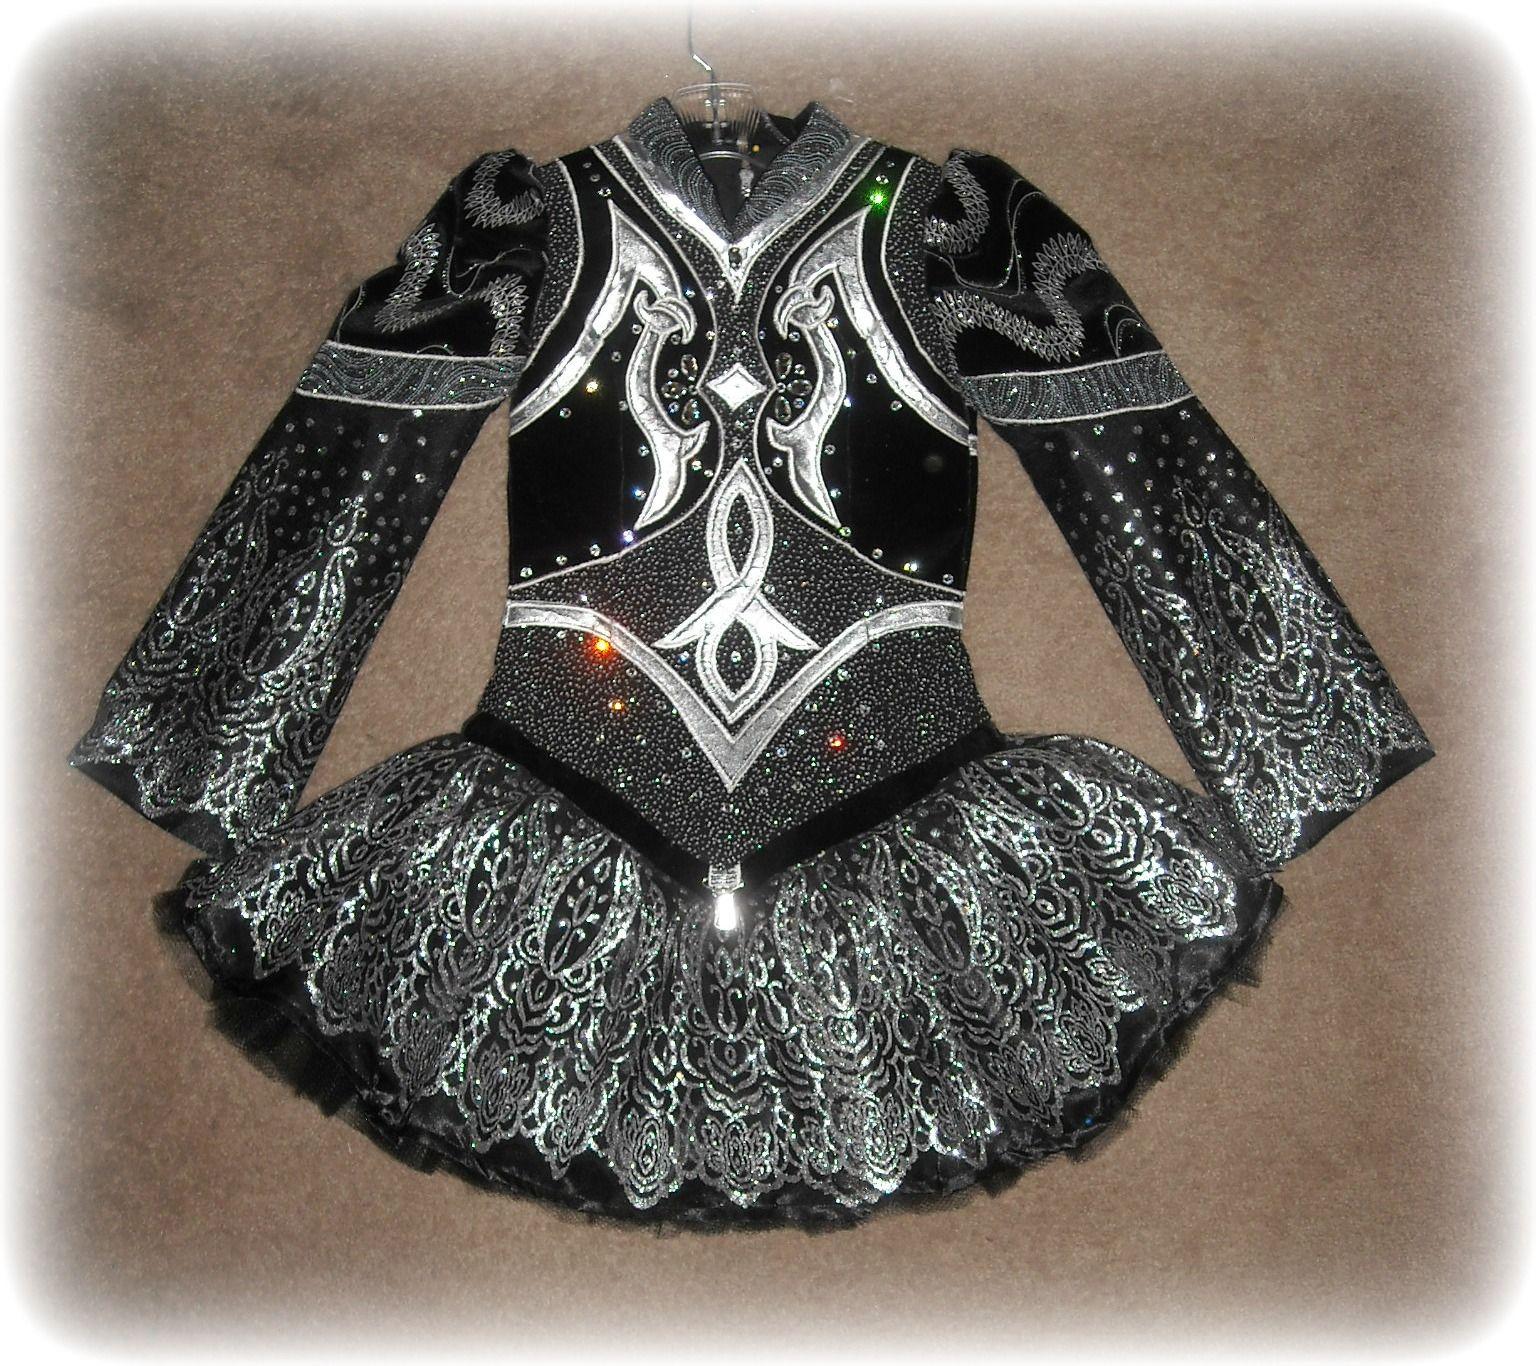 Irish Dance Solo Dress Costume - pretty fabric